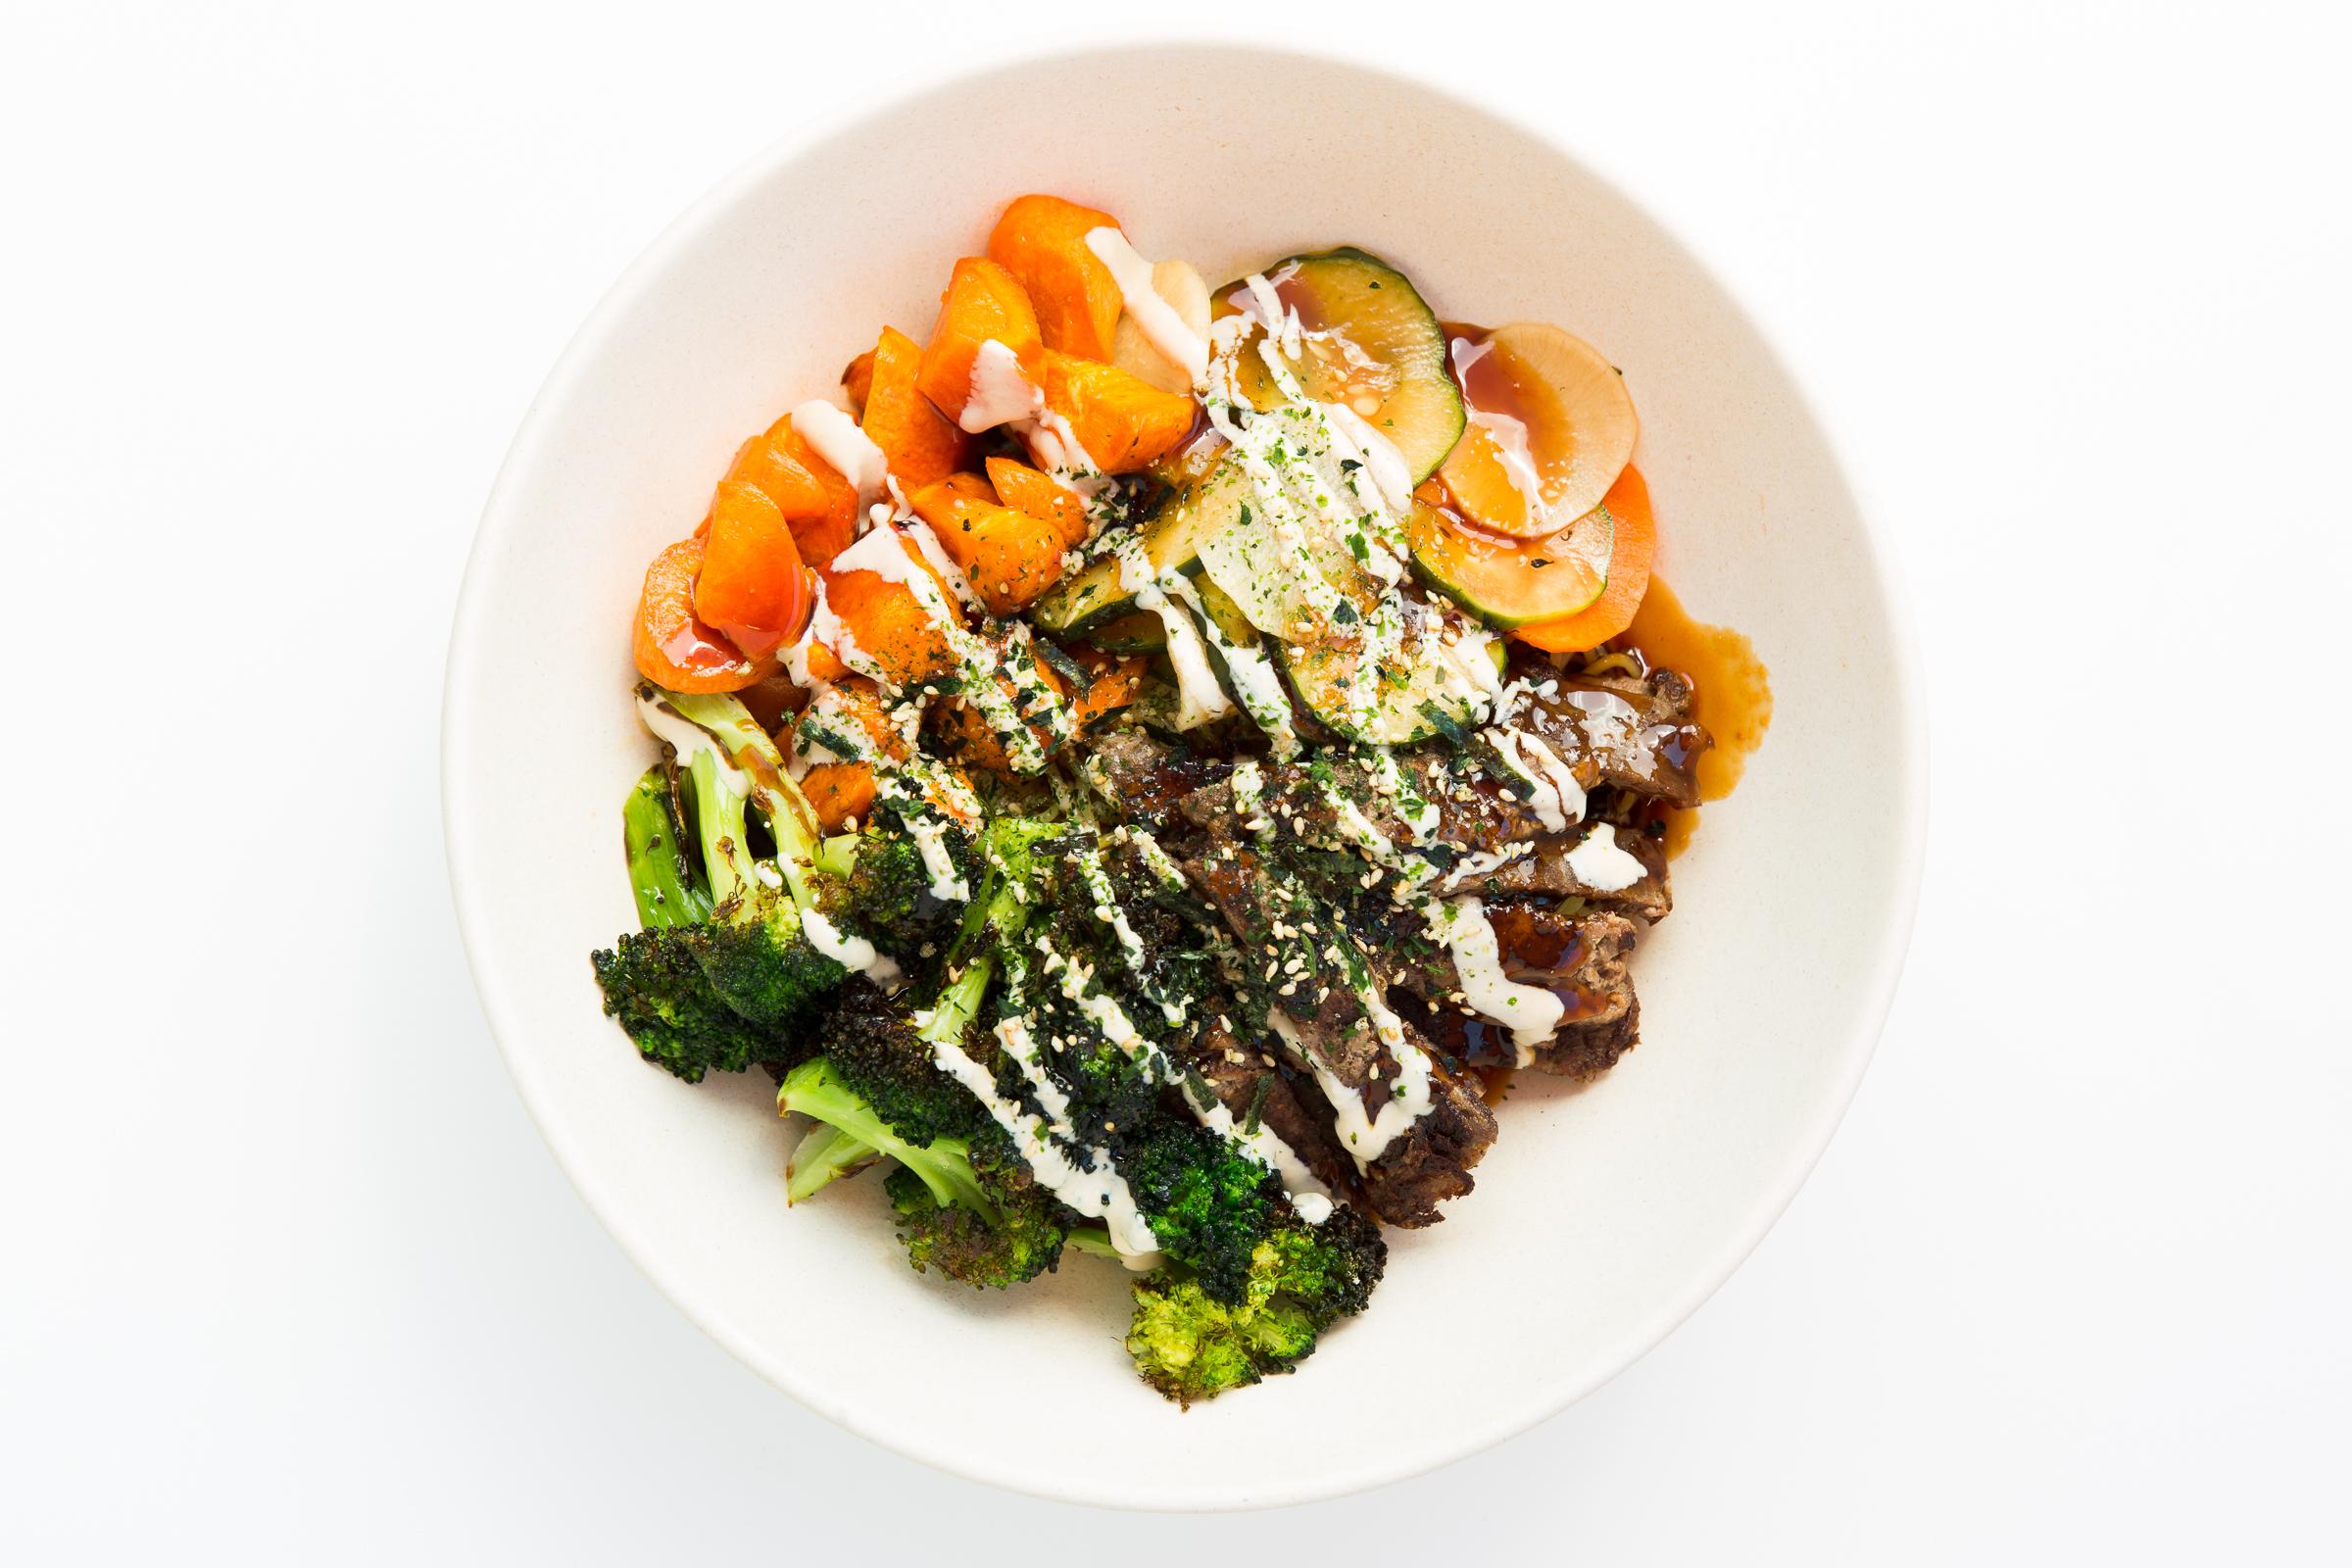 Ramen, Steak, Vegs, Sauce and Seasoning  Courtesy of Dragon Bowl